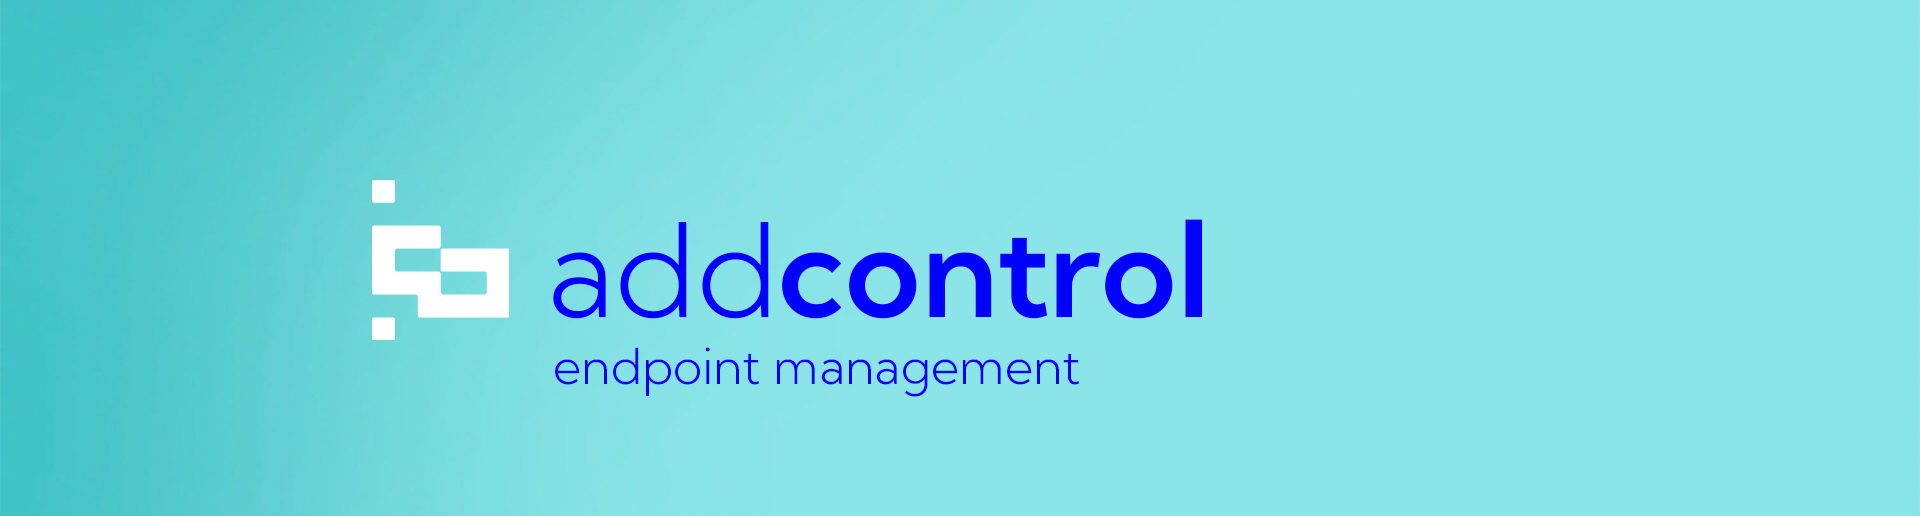 Endpoint Management